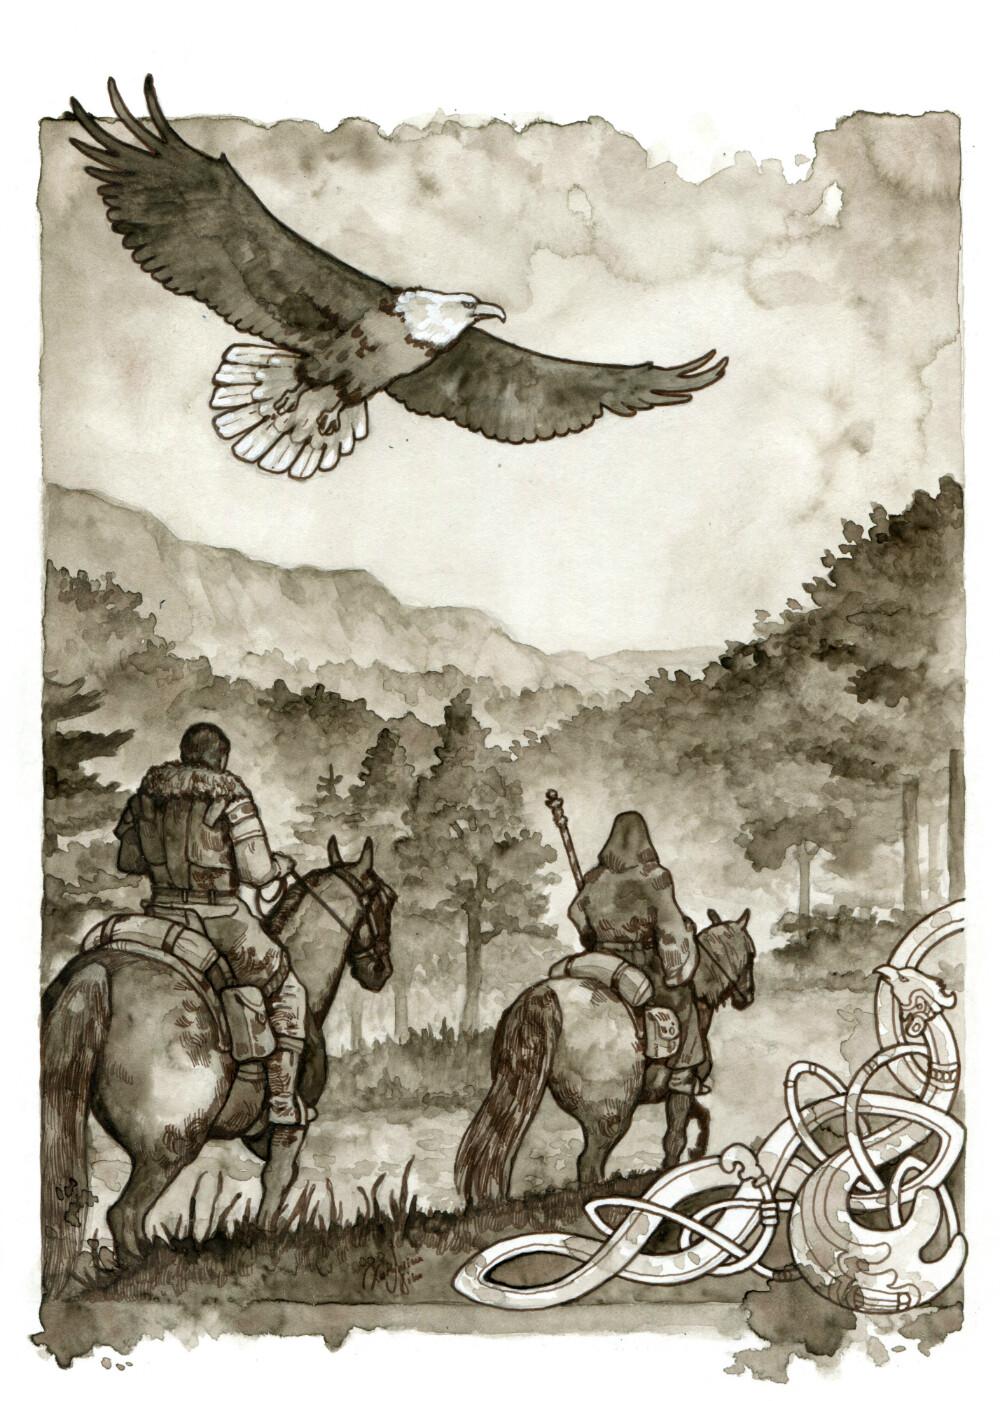 The magician follows the travelers as an eagle